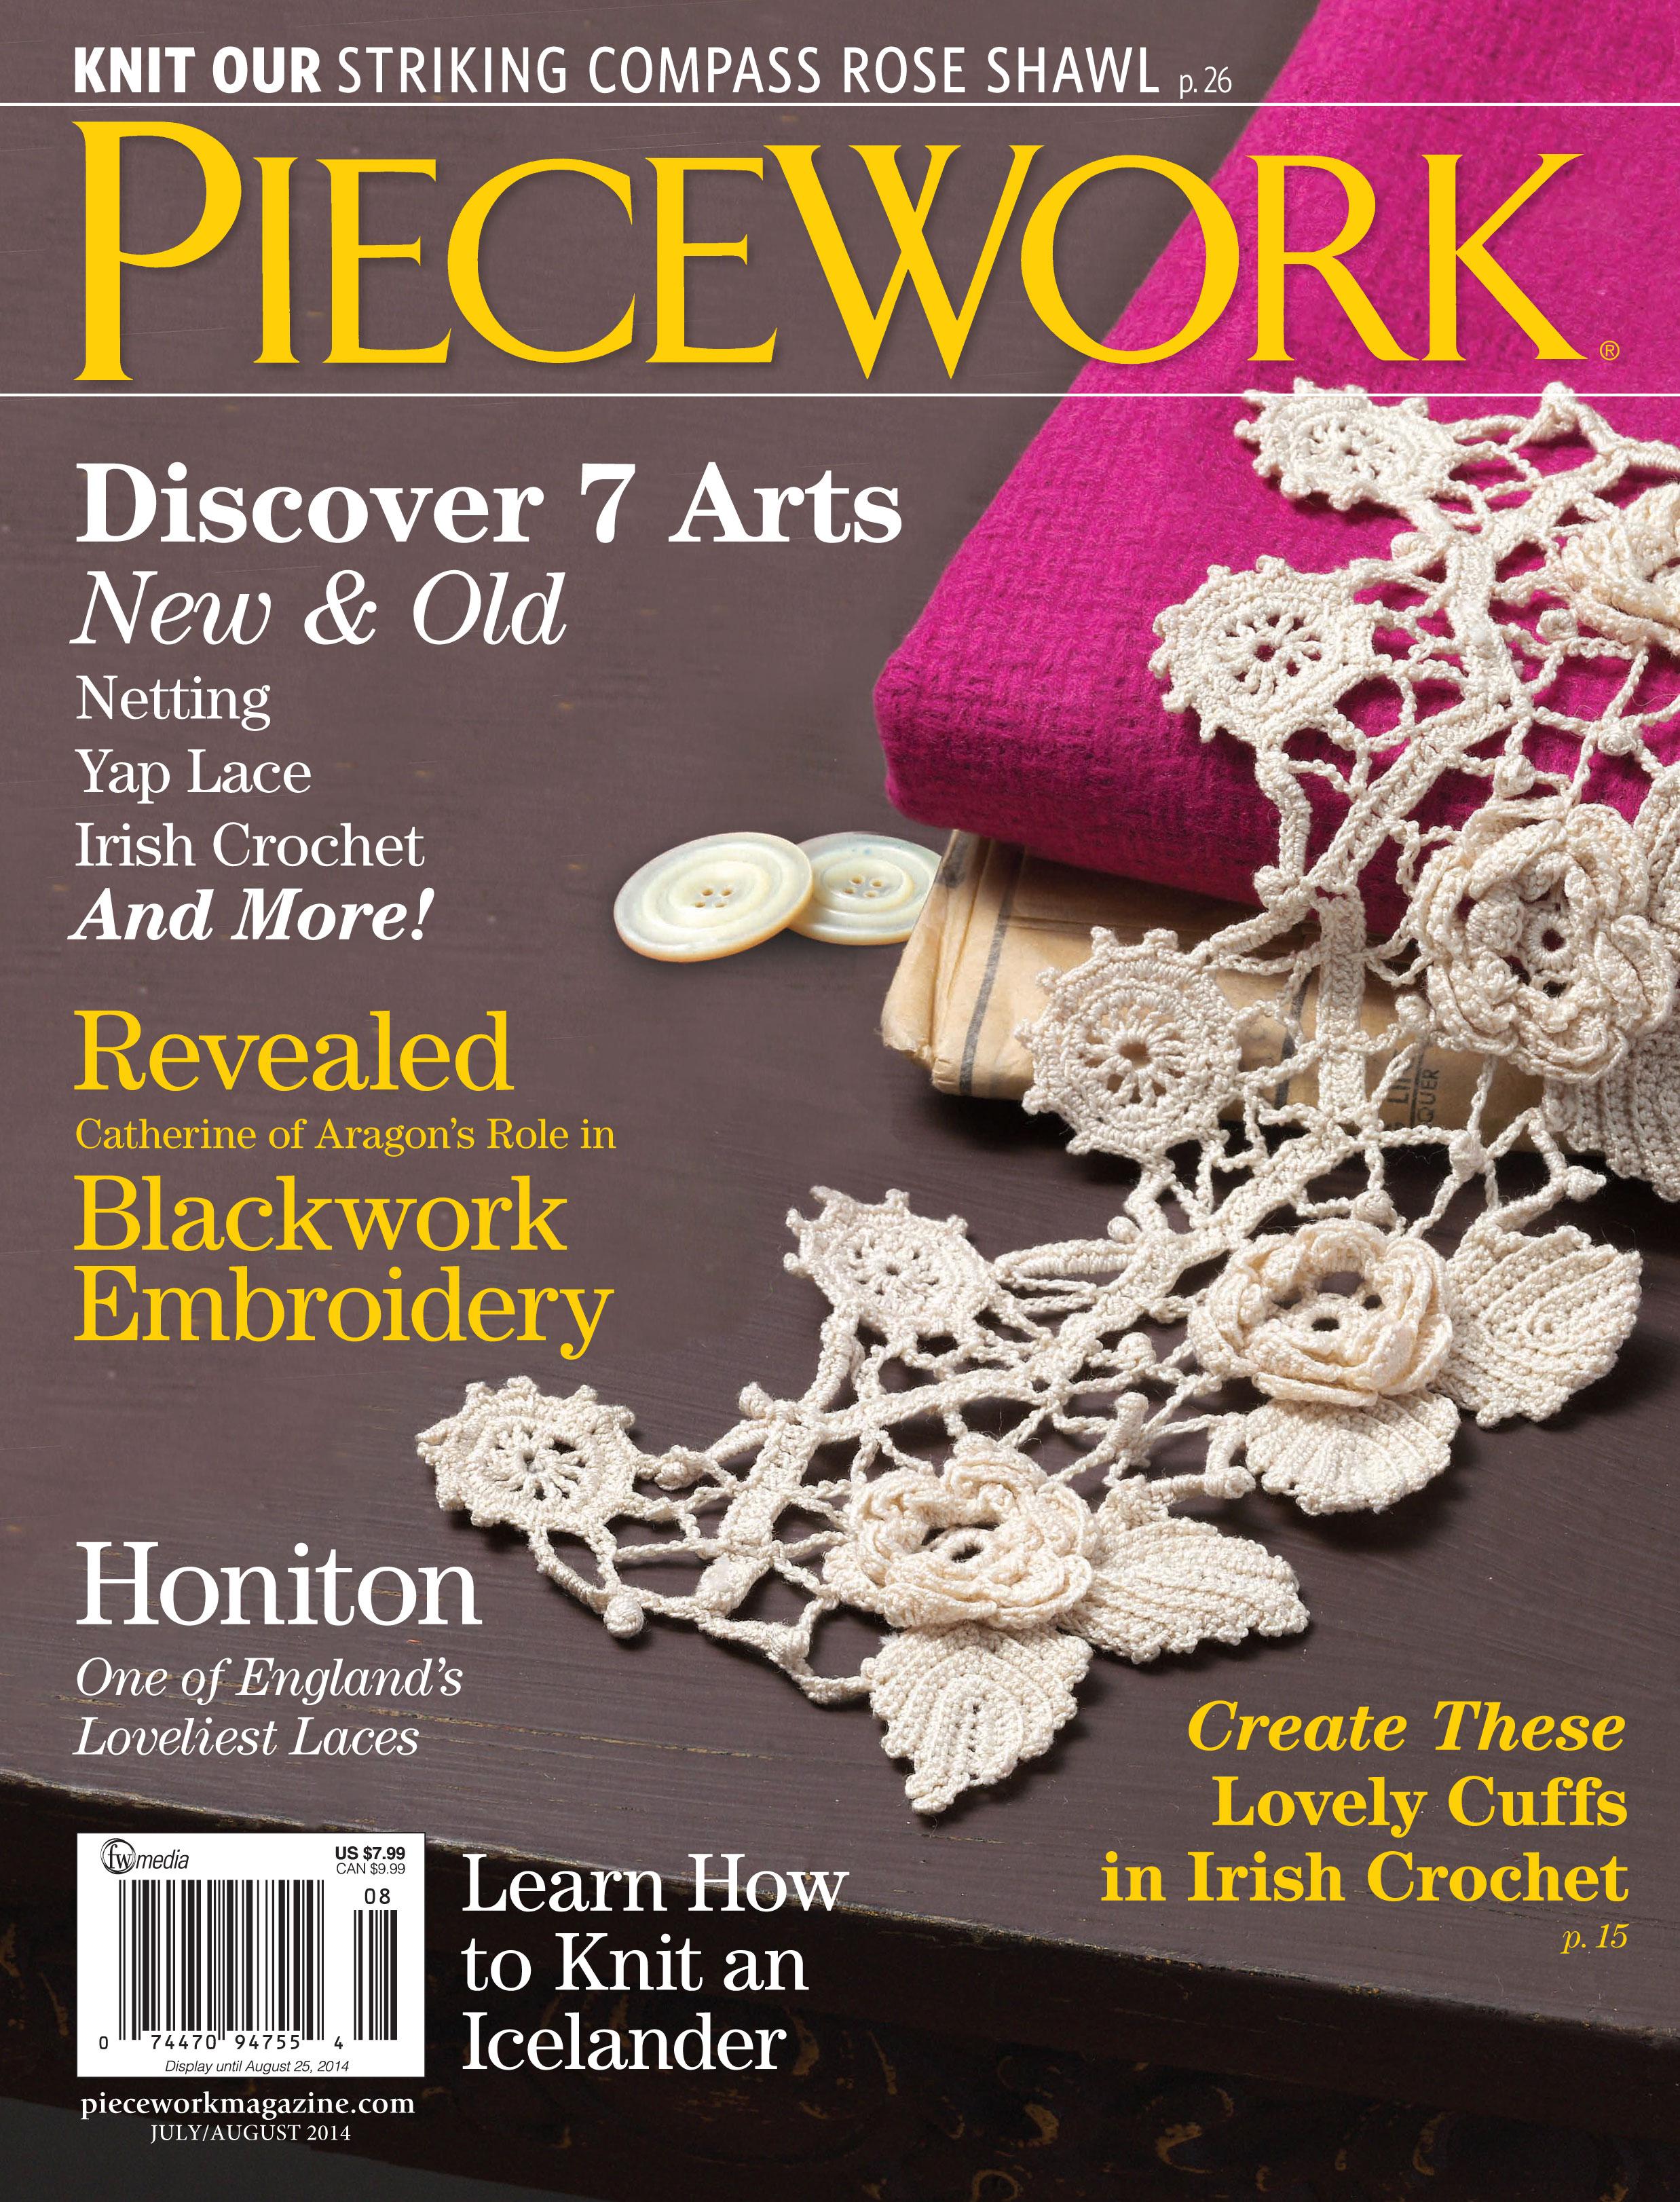 PieceWork July/Aug 2014 cover, my Irish Crochet cuffs